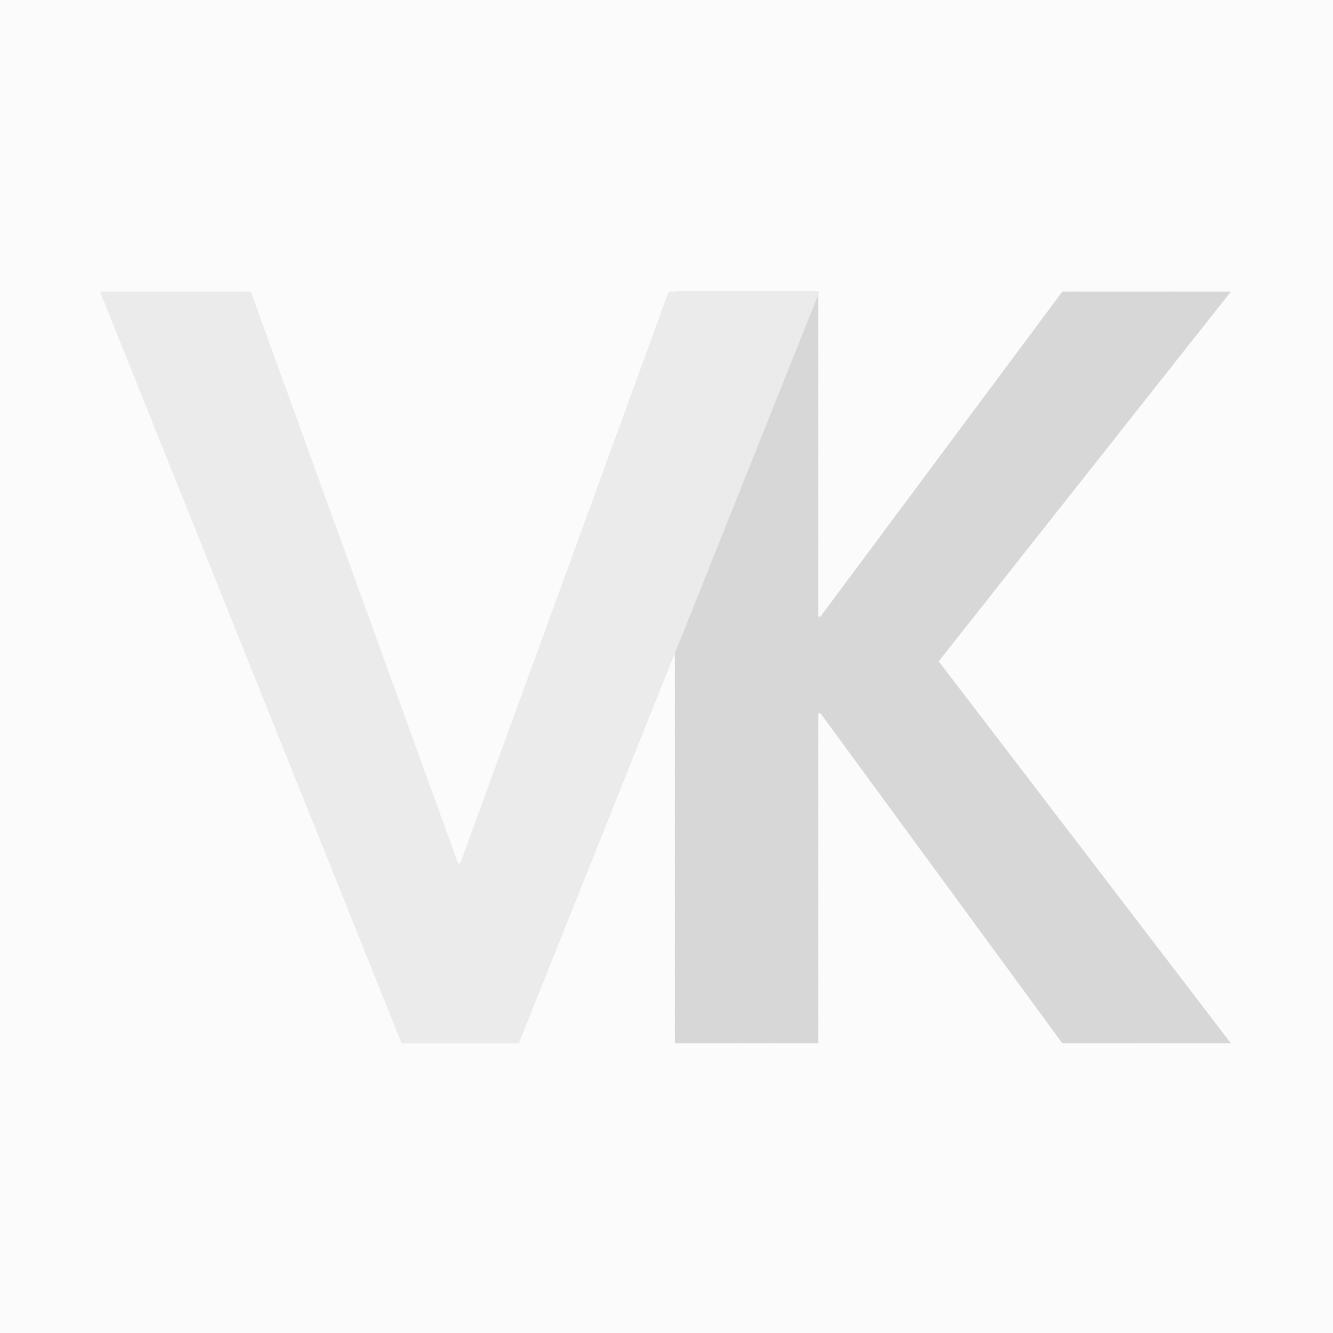 Kis Kleurenkaart (Versie 2019)